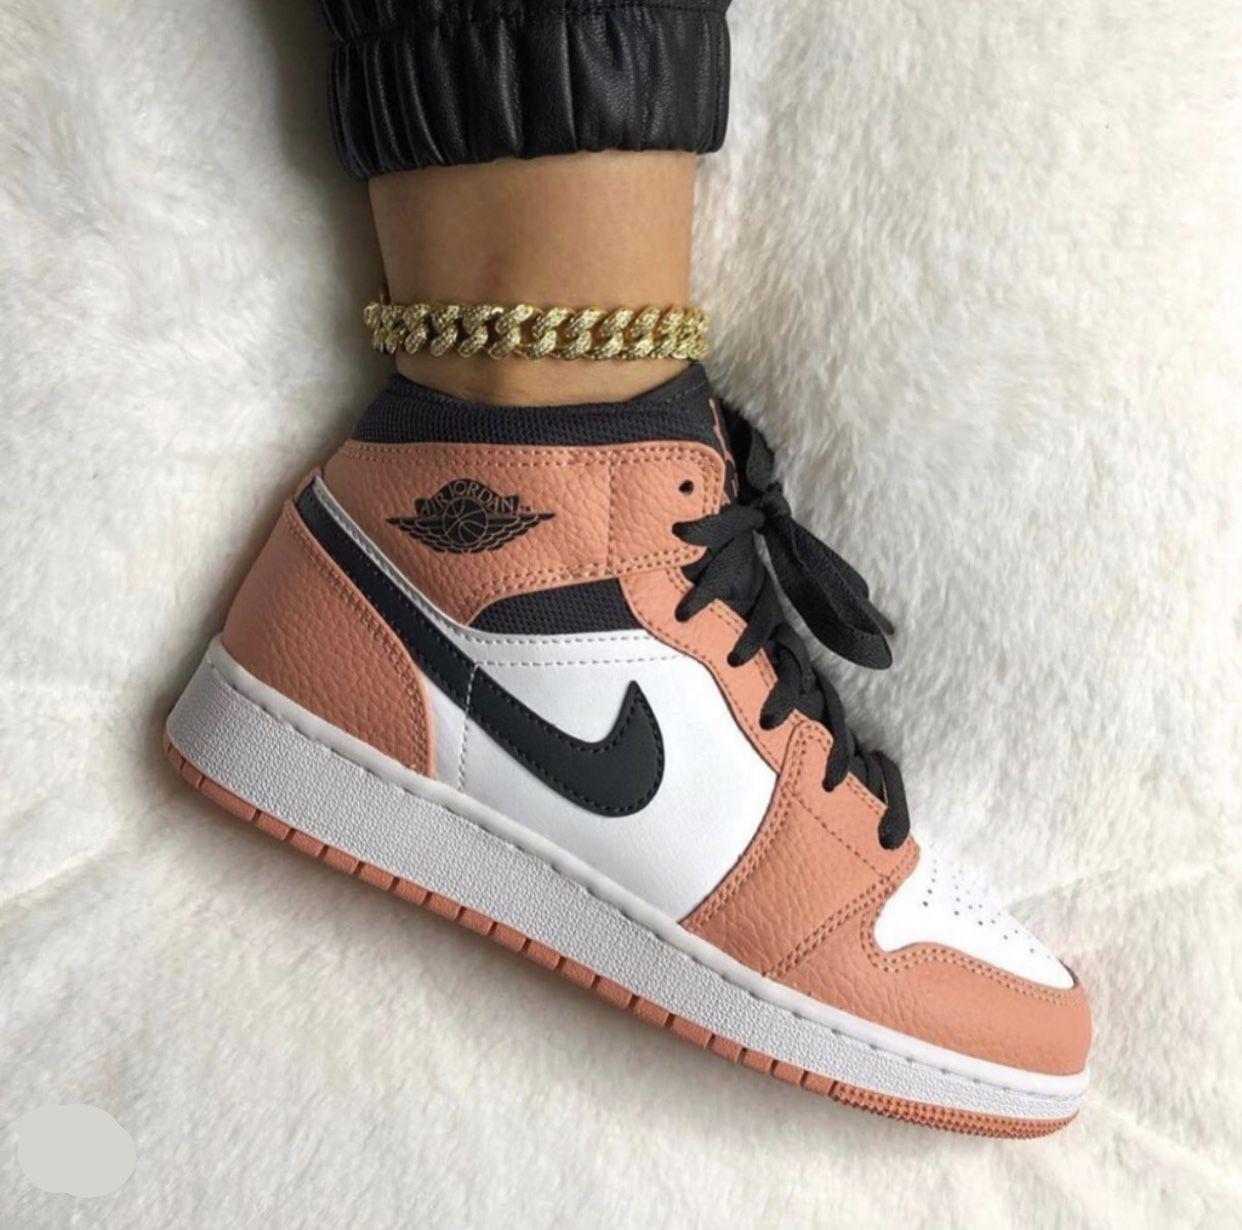 Pin By Lola Munoz On Shoes Jordan Shoes Girls Sneakers Fashion All Nike Shoes